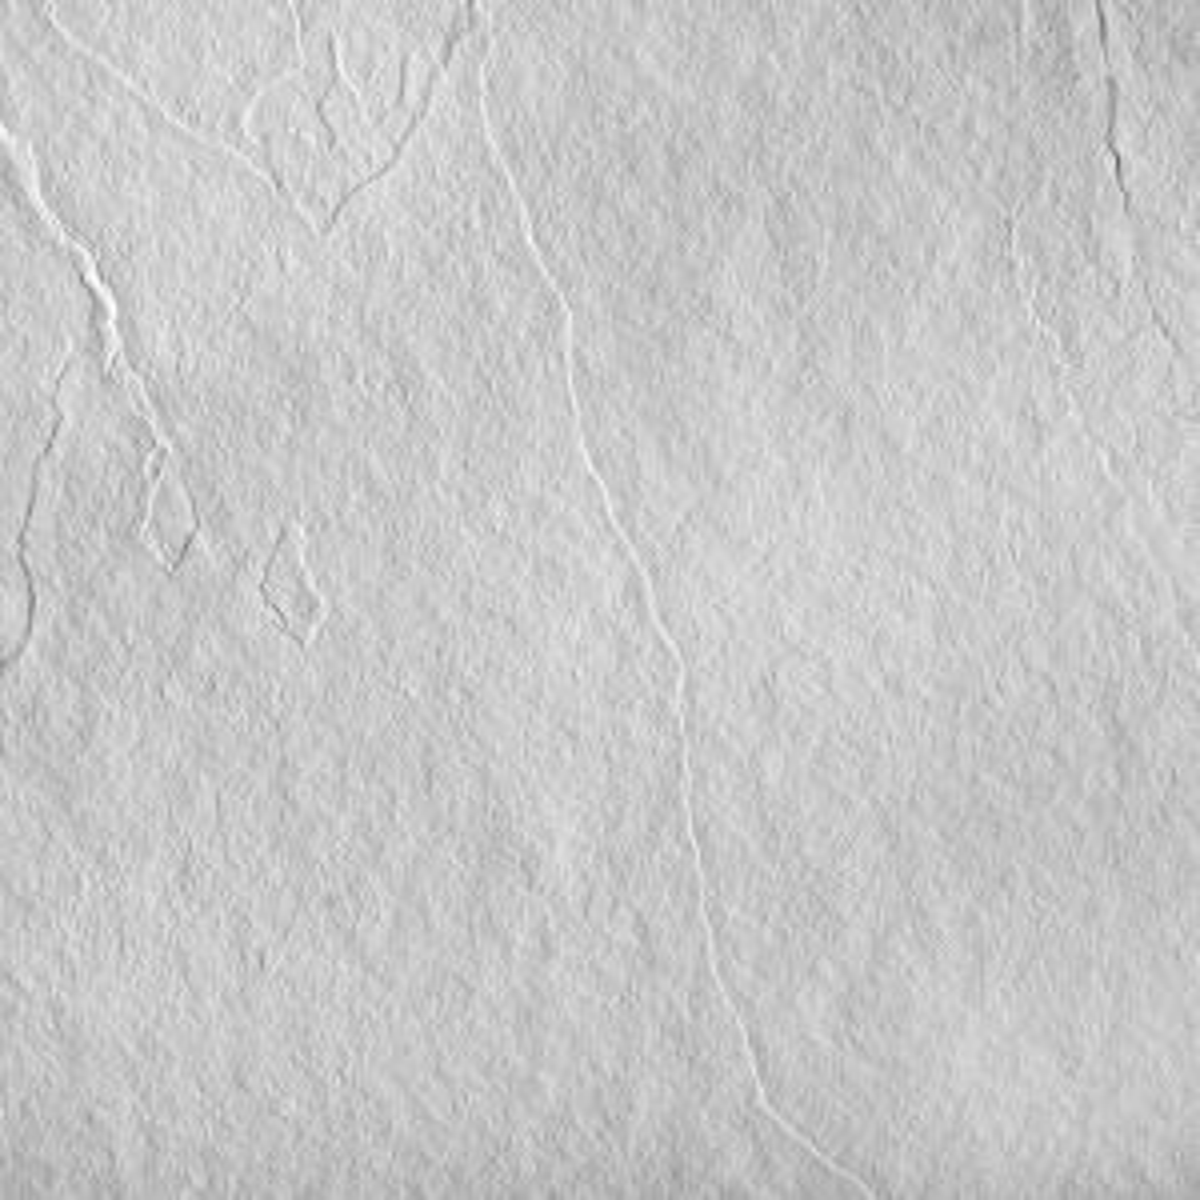 Merlyn Truestone White Offset Quadrant Shower Tray Right Hand 1200 x 900mm